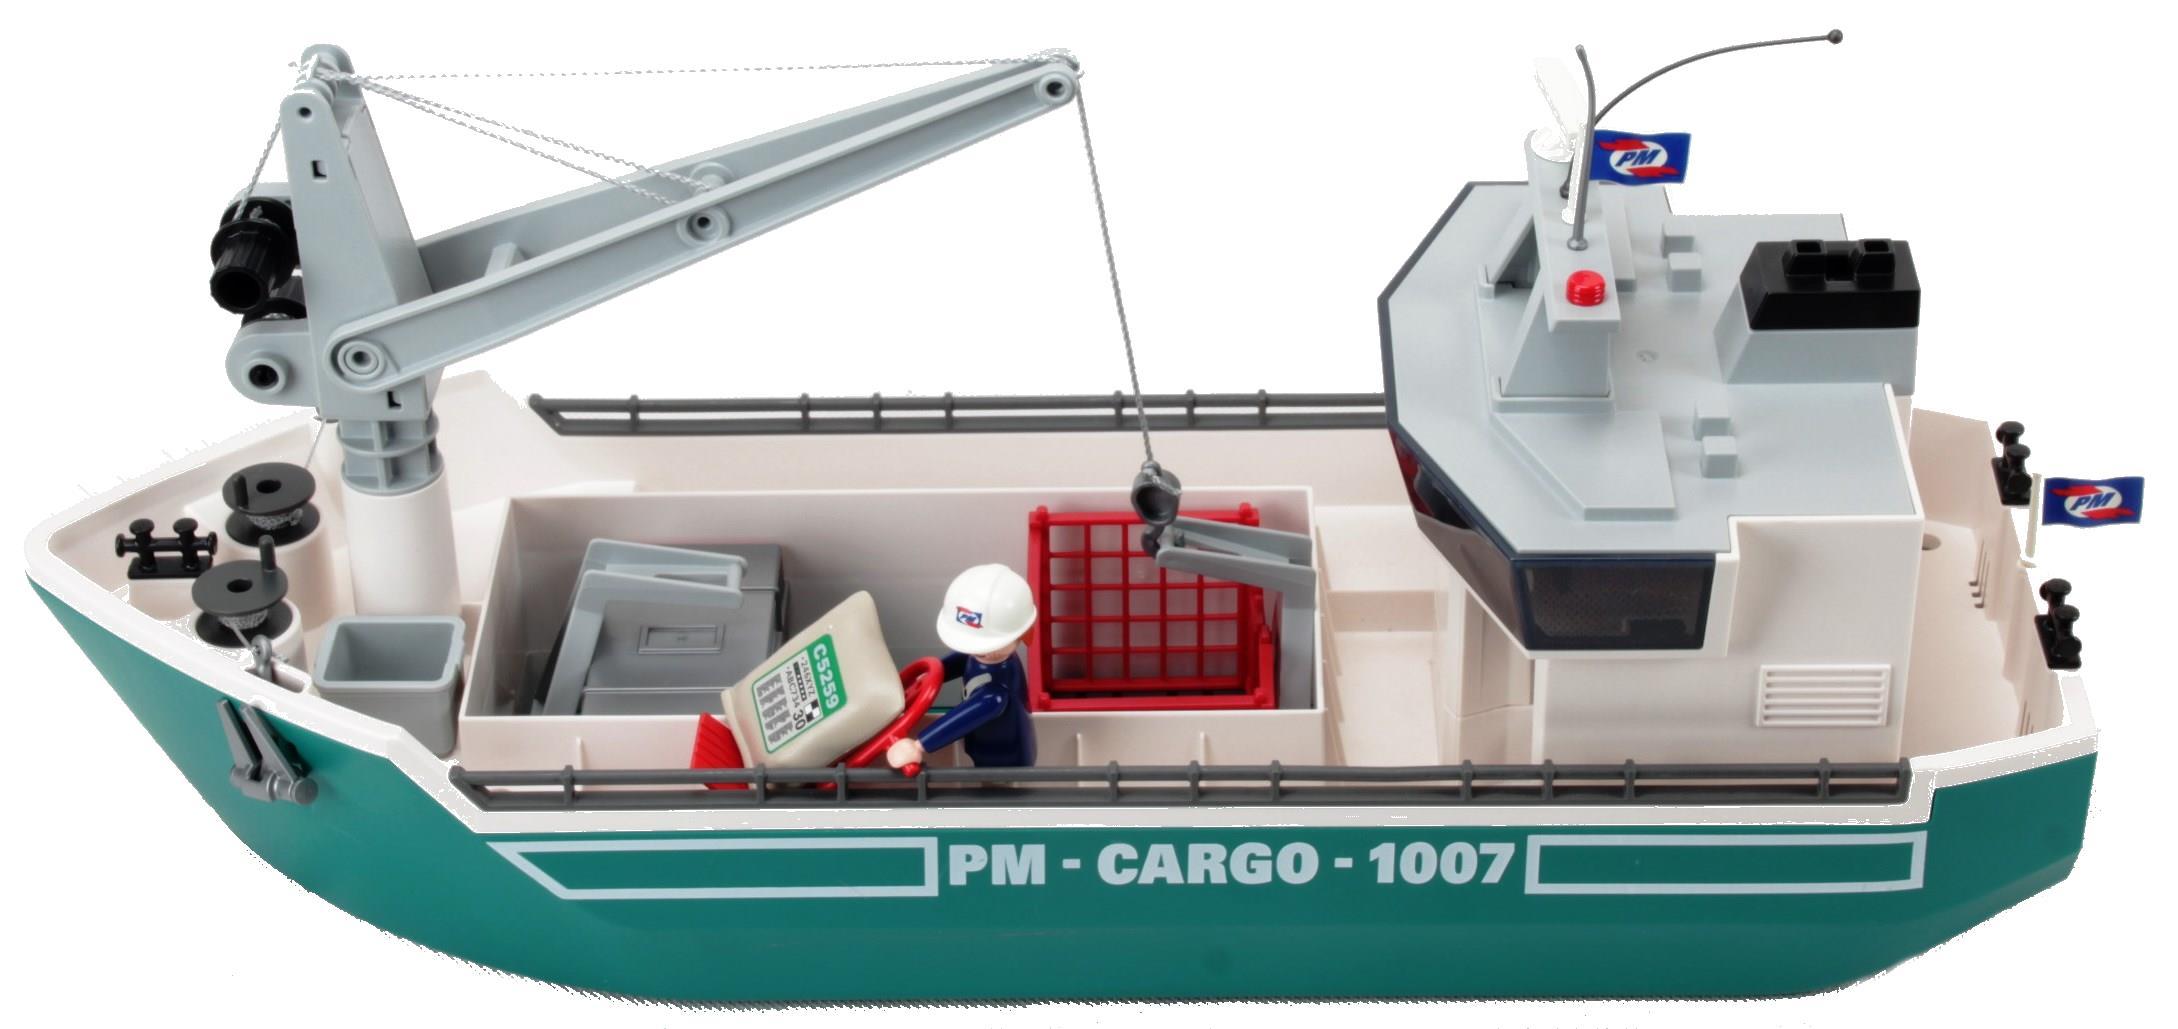 Playmobil - Frachtschiff Mit Verladekran - Decotoys ganzes Playmobil Containerschiff